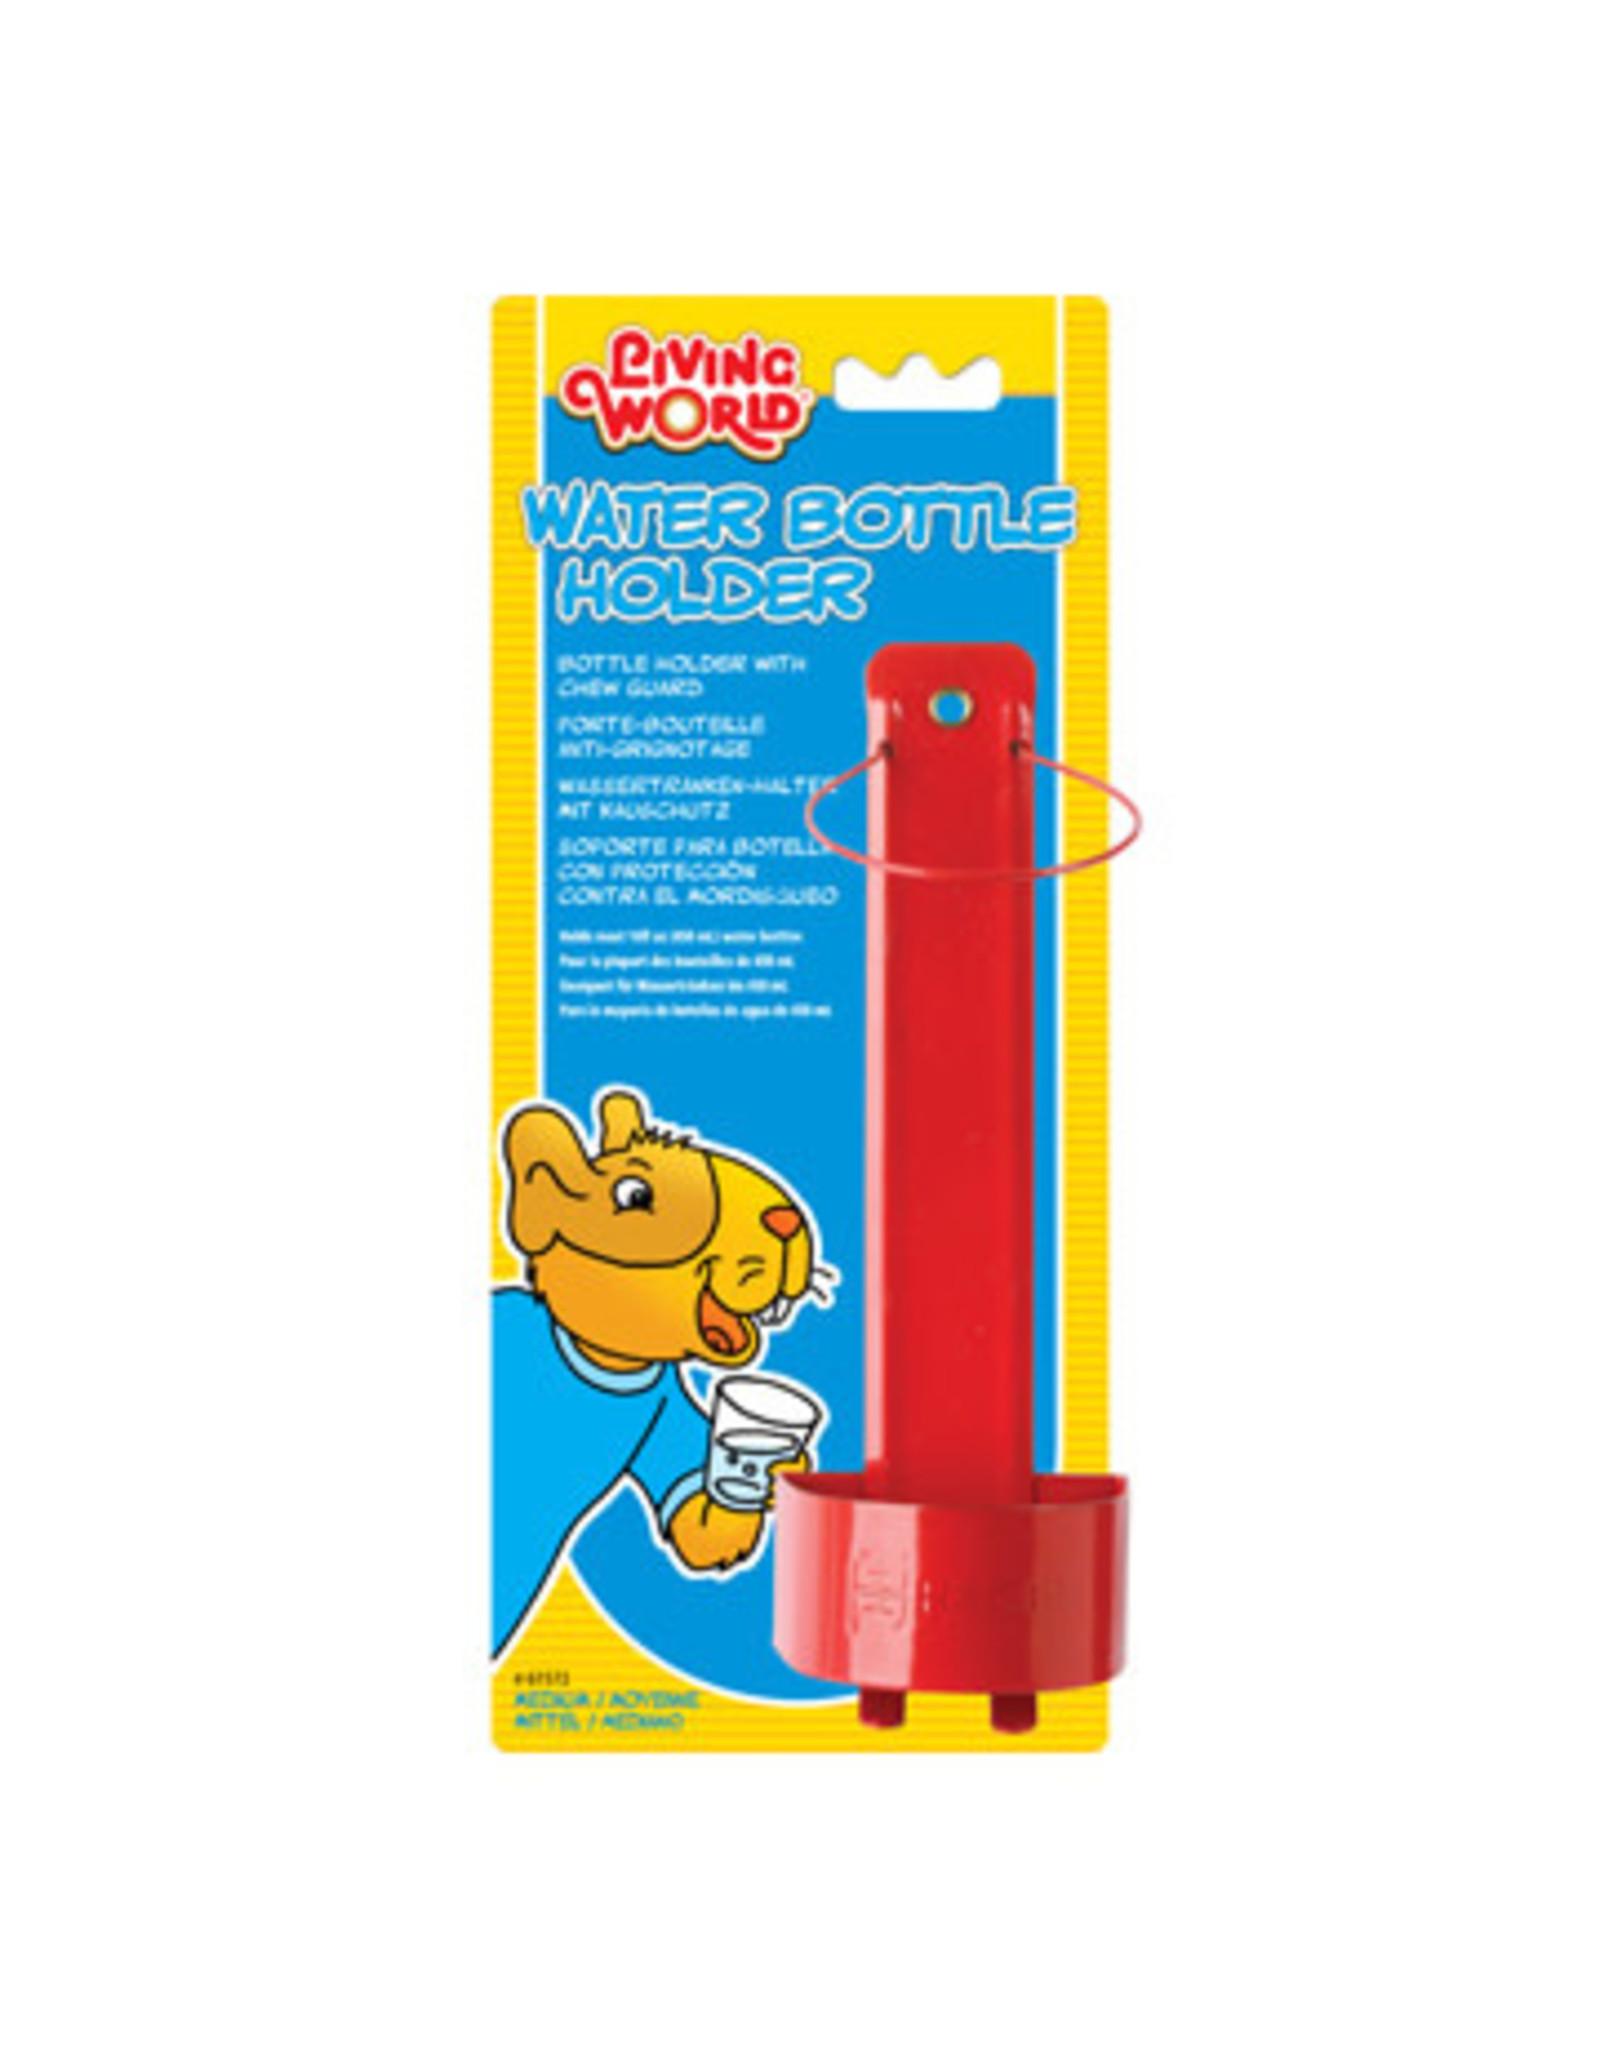 Living World Metal Water Bottle Holder - Medium - Fits 61540 - Red